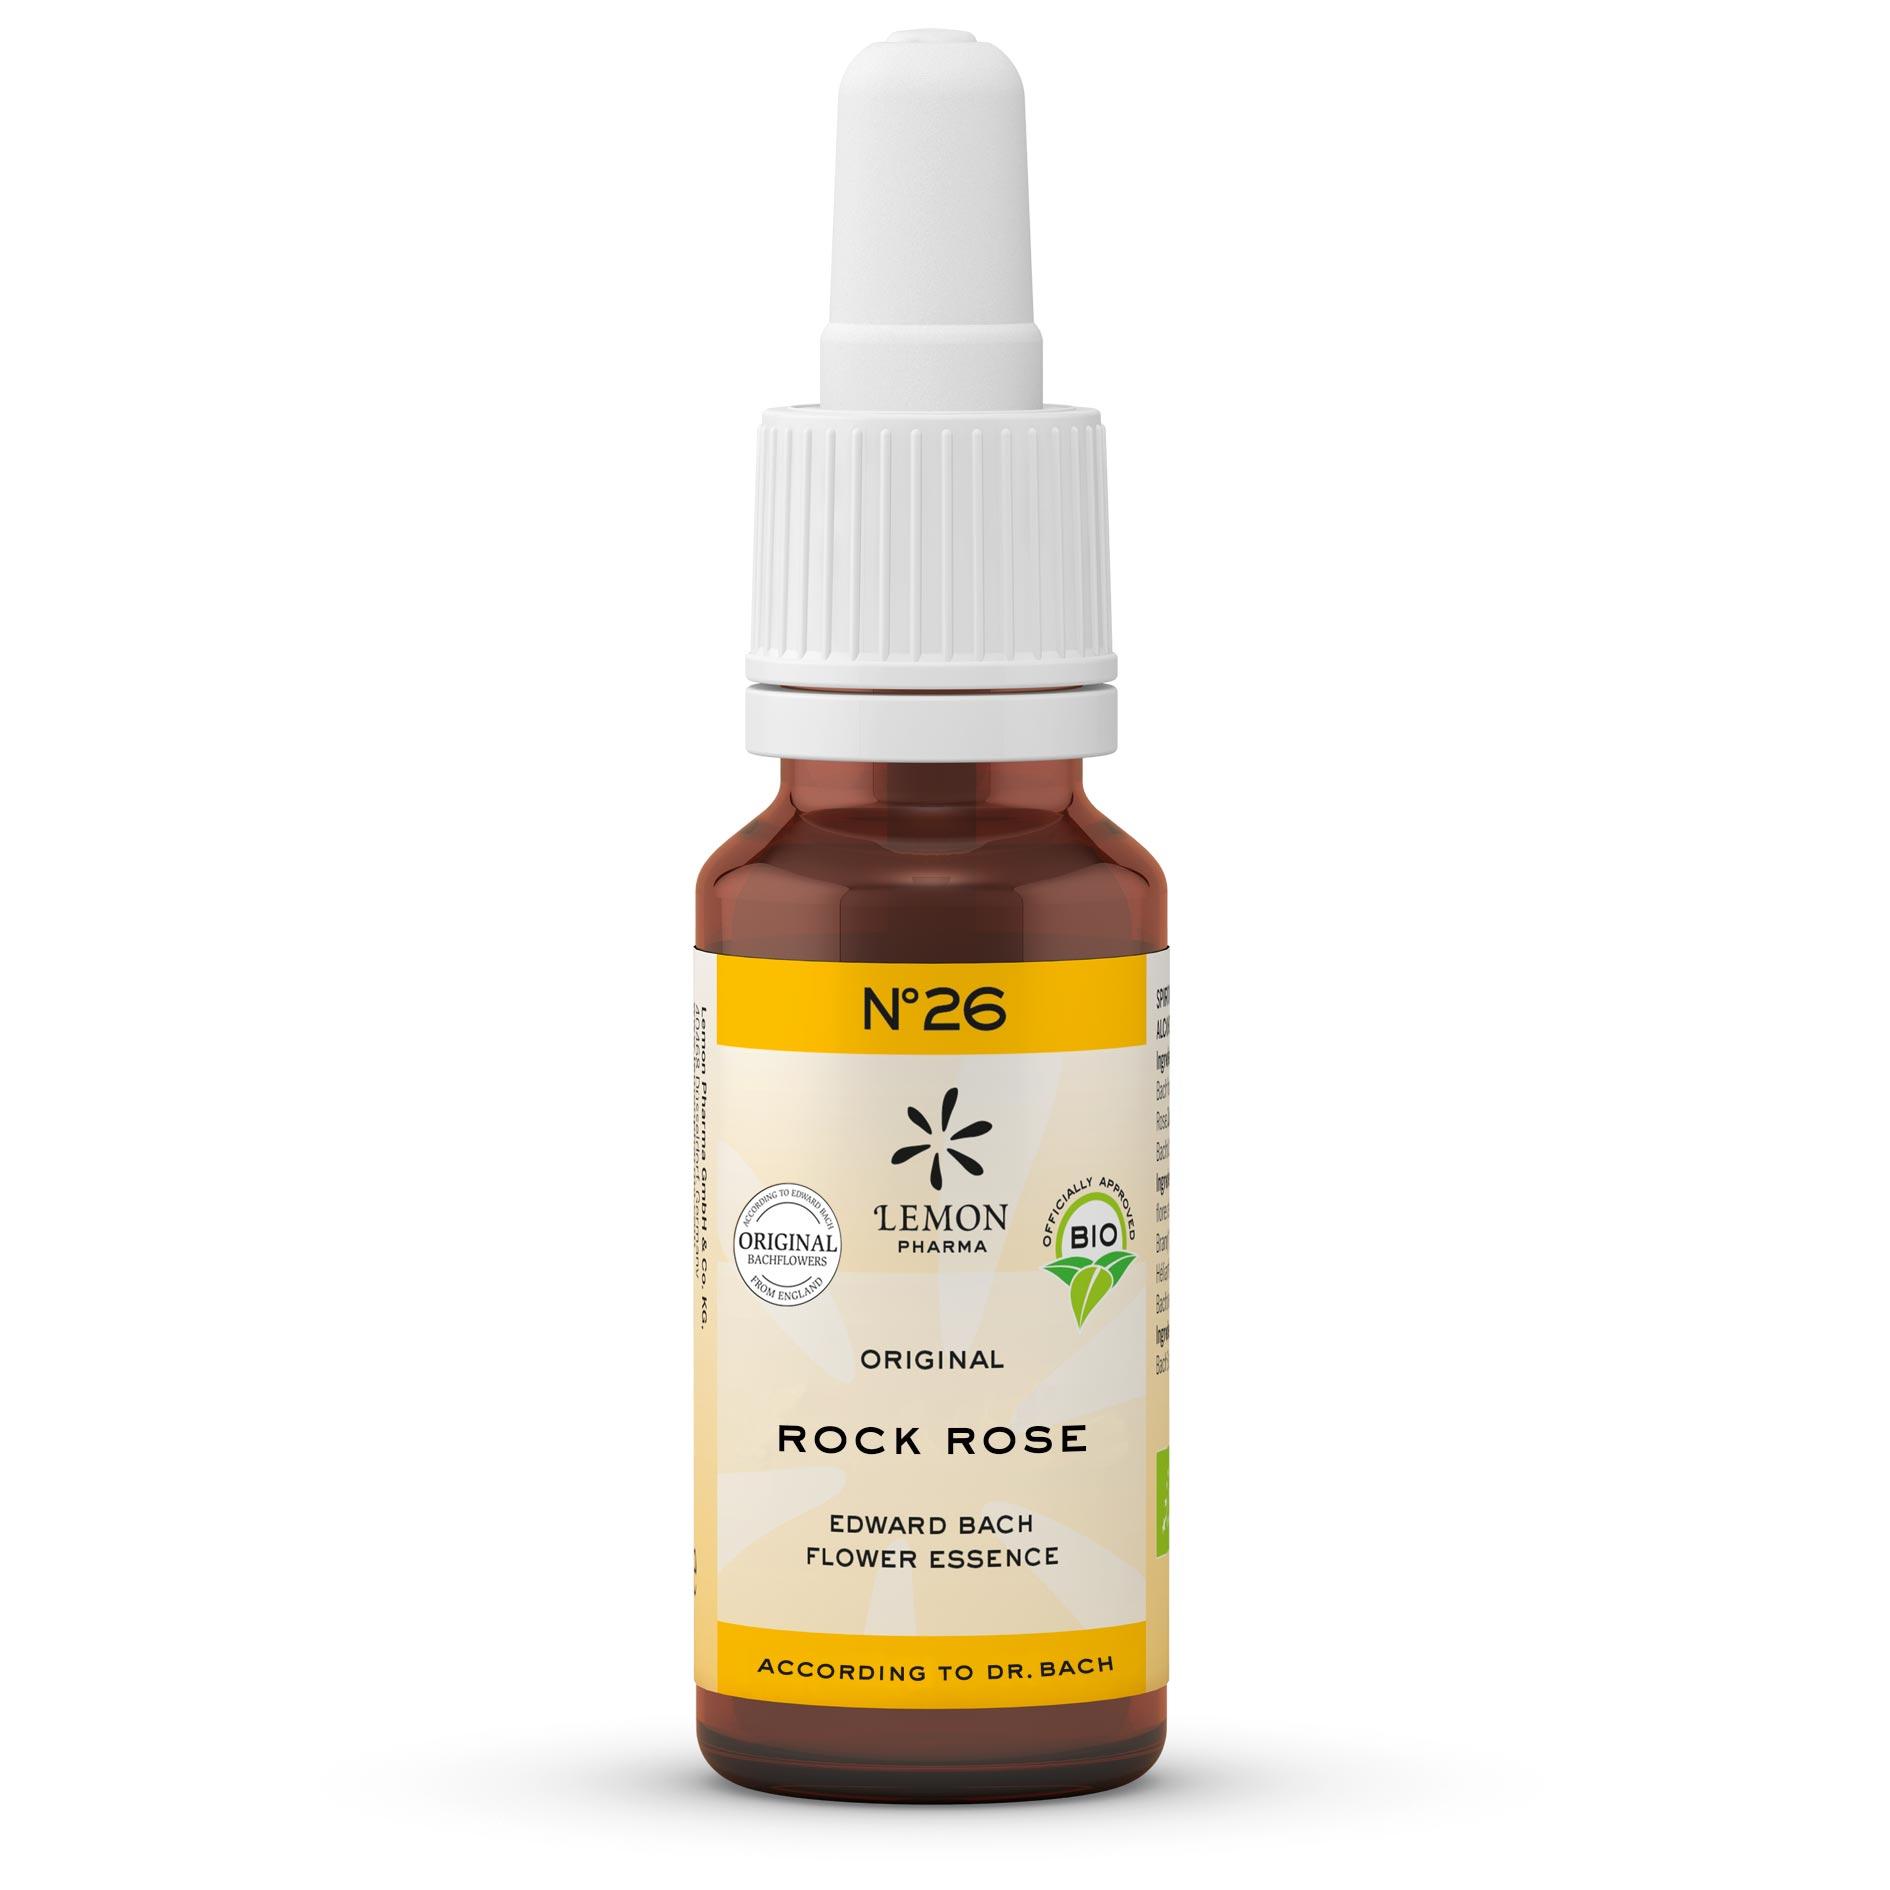 Lemon Pharma Original Bachblüten Tropfen Nr 26 Rock Rose Gelbes Sonnenröschen Innere Stärke